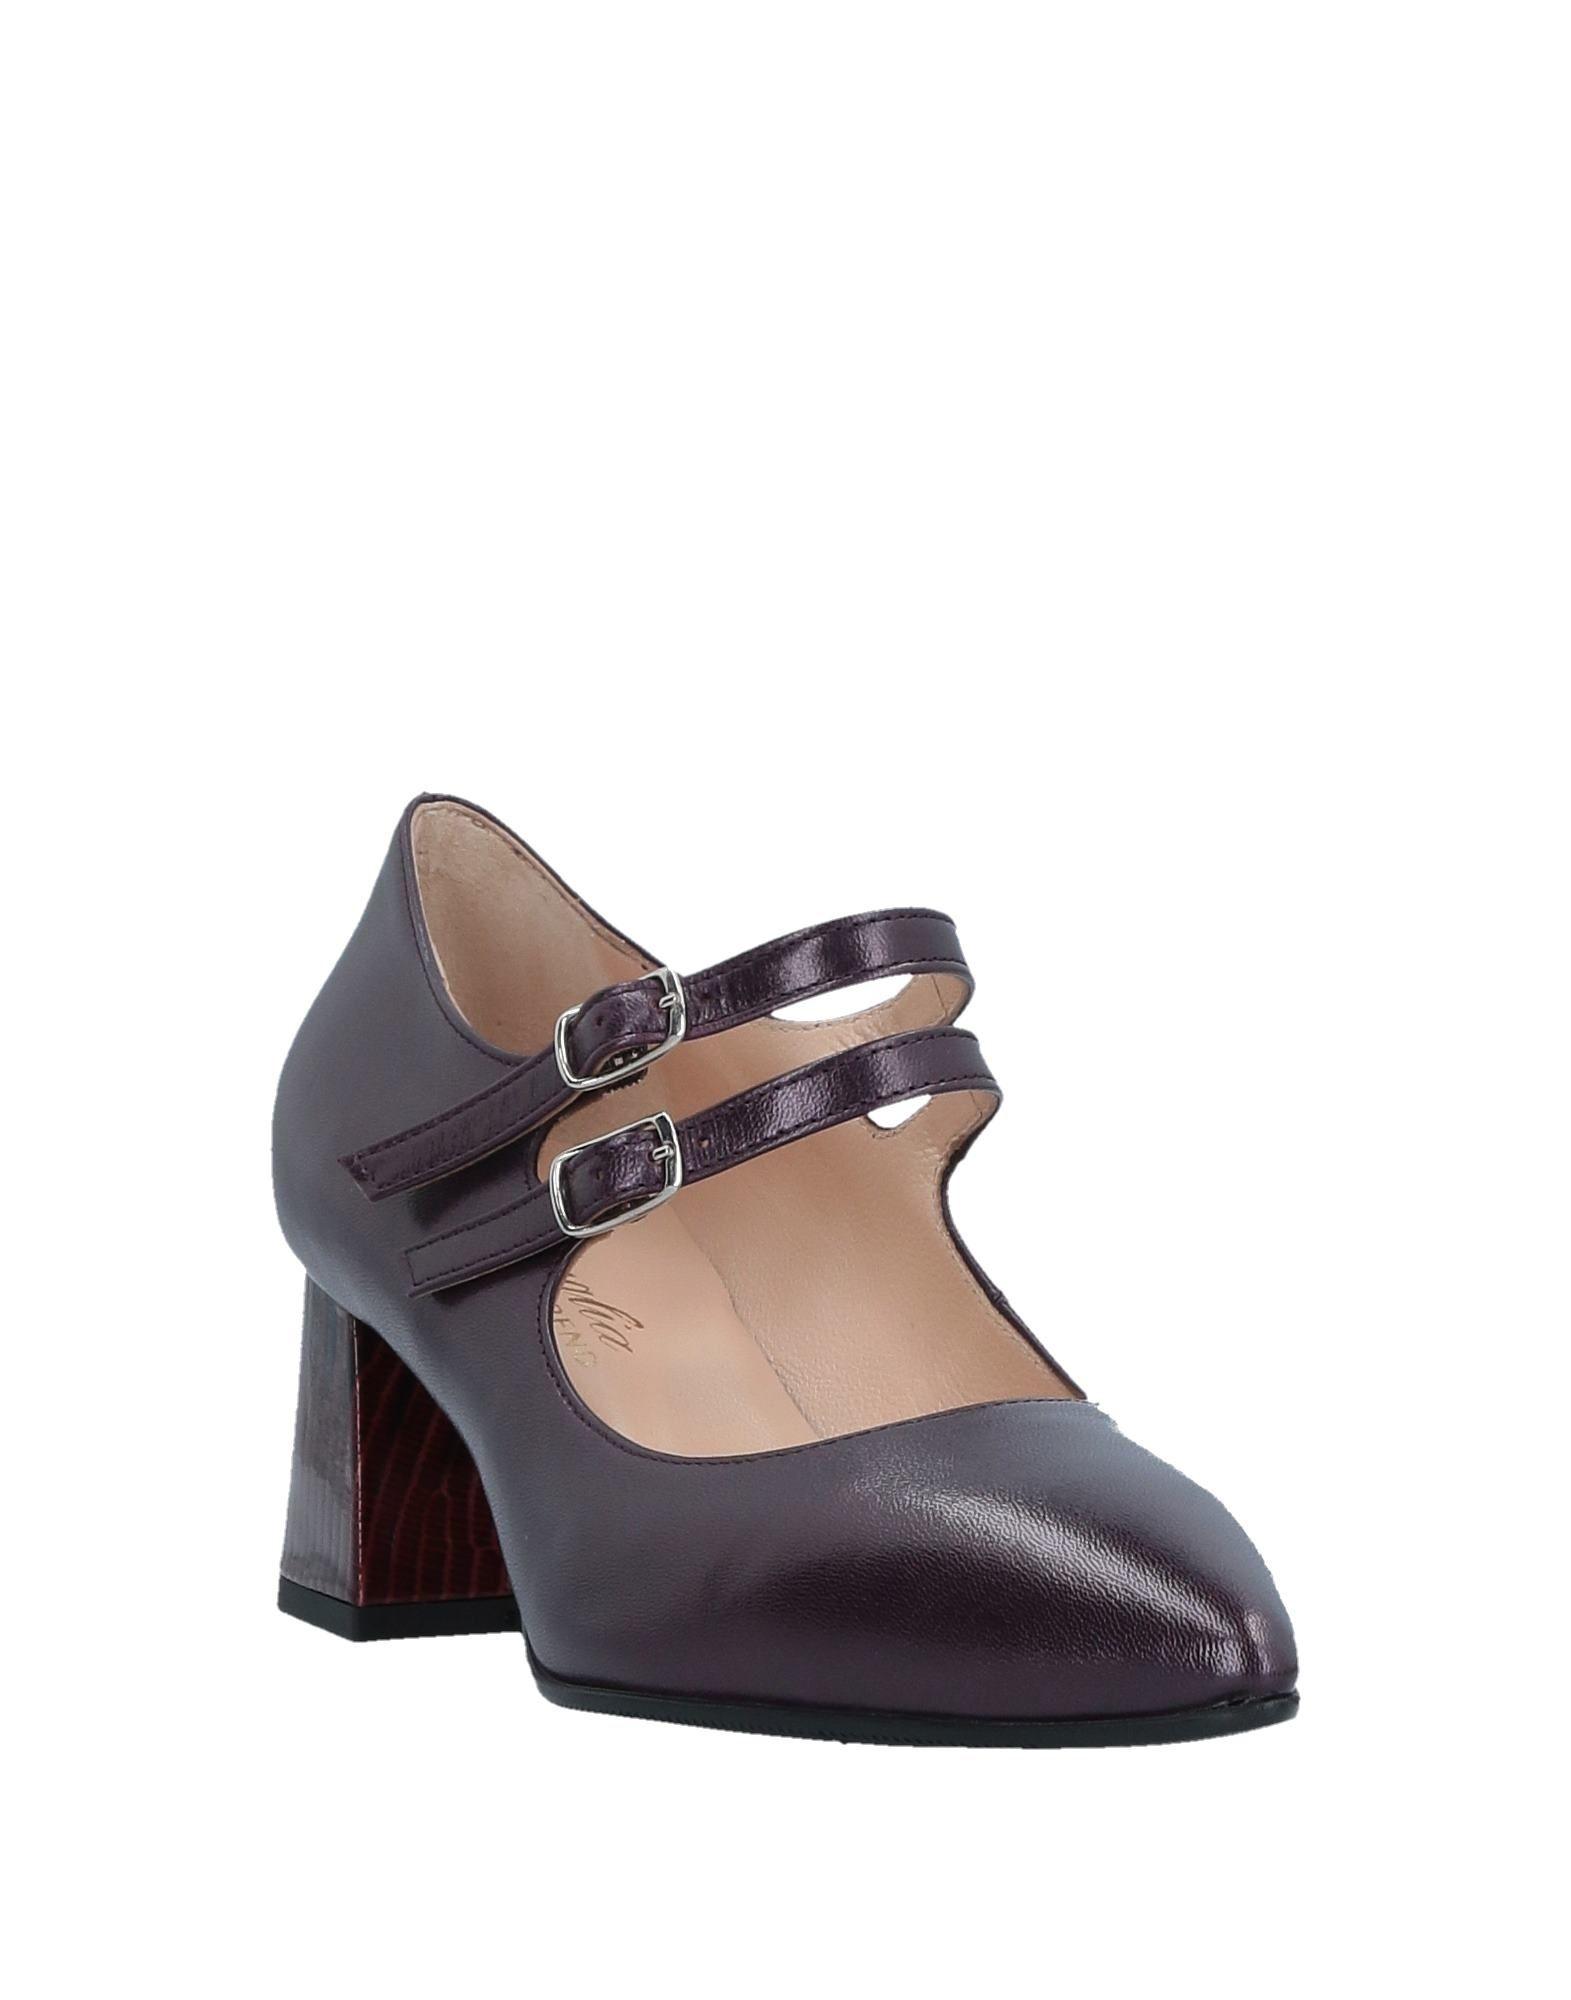 Stilvolle billige Schuhe F.Lli  Bruglia Pumps Damen  F.Lli 11520250PH 6fde61